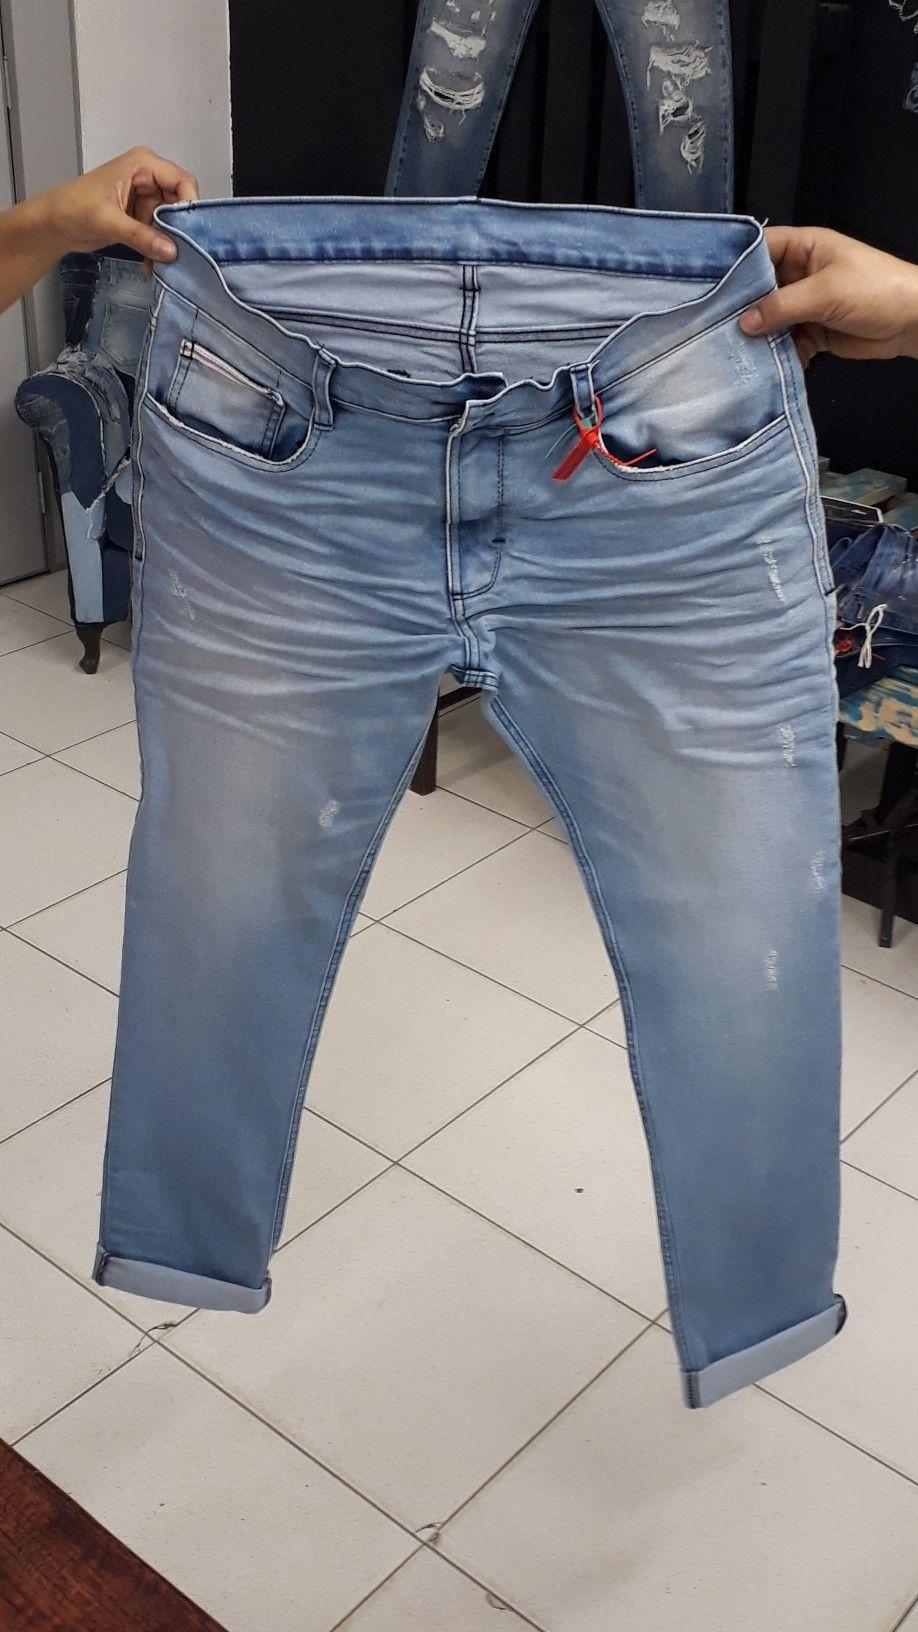 Pin De Wilson Tenemea En Lavados De Pantalon Jeans Para Hombre Pantalones De Hombre Ropa De Hombre